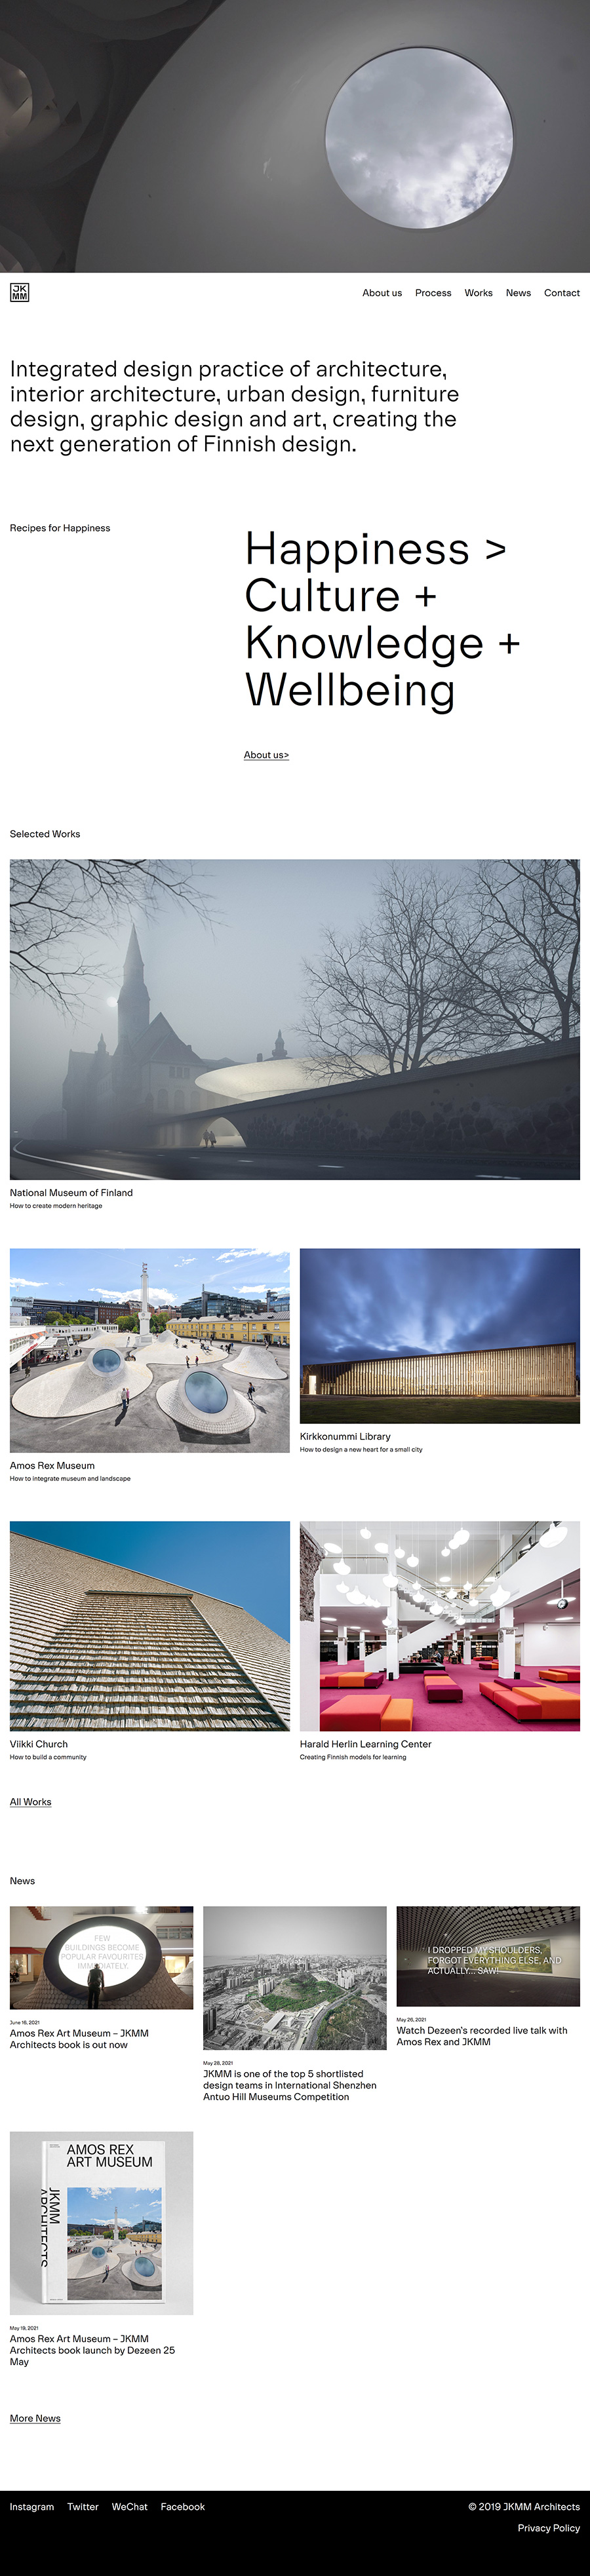 JKMM Best Architecture Website